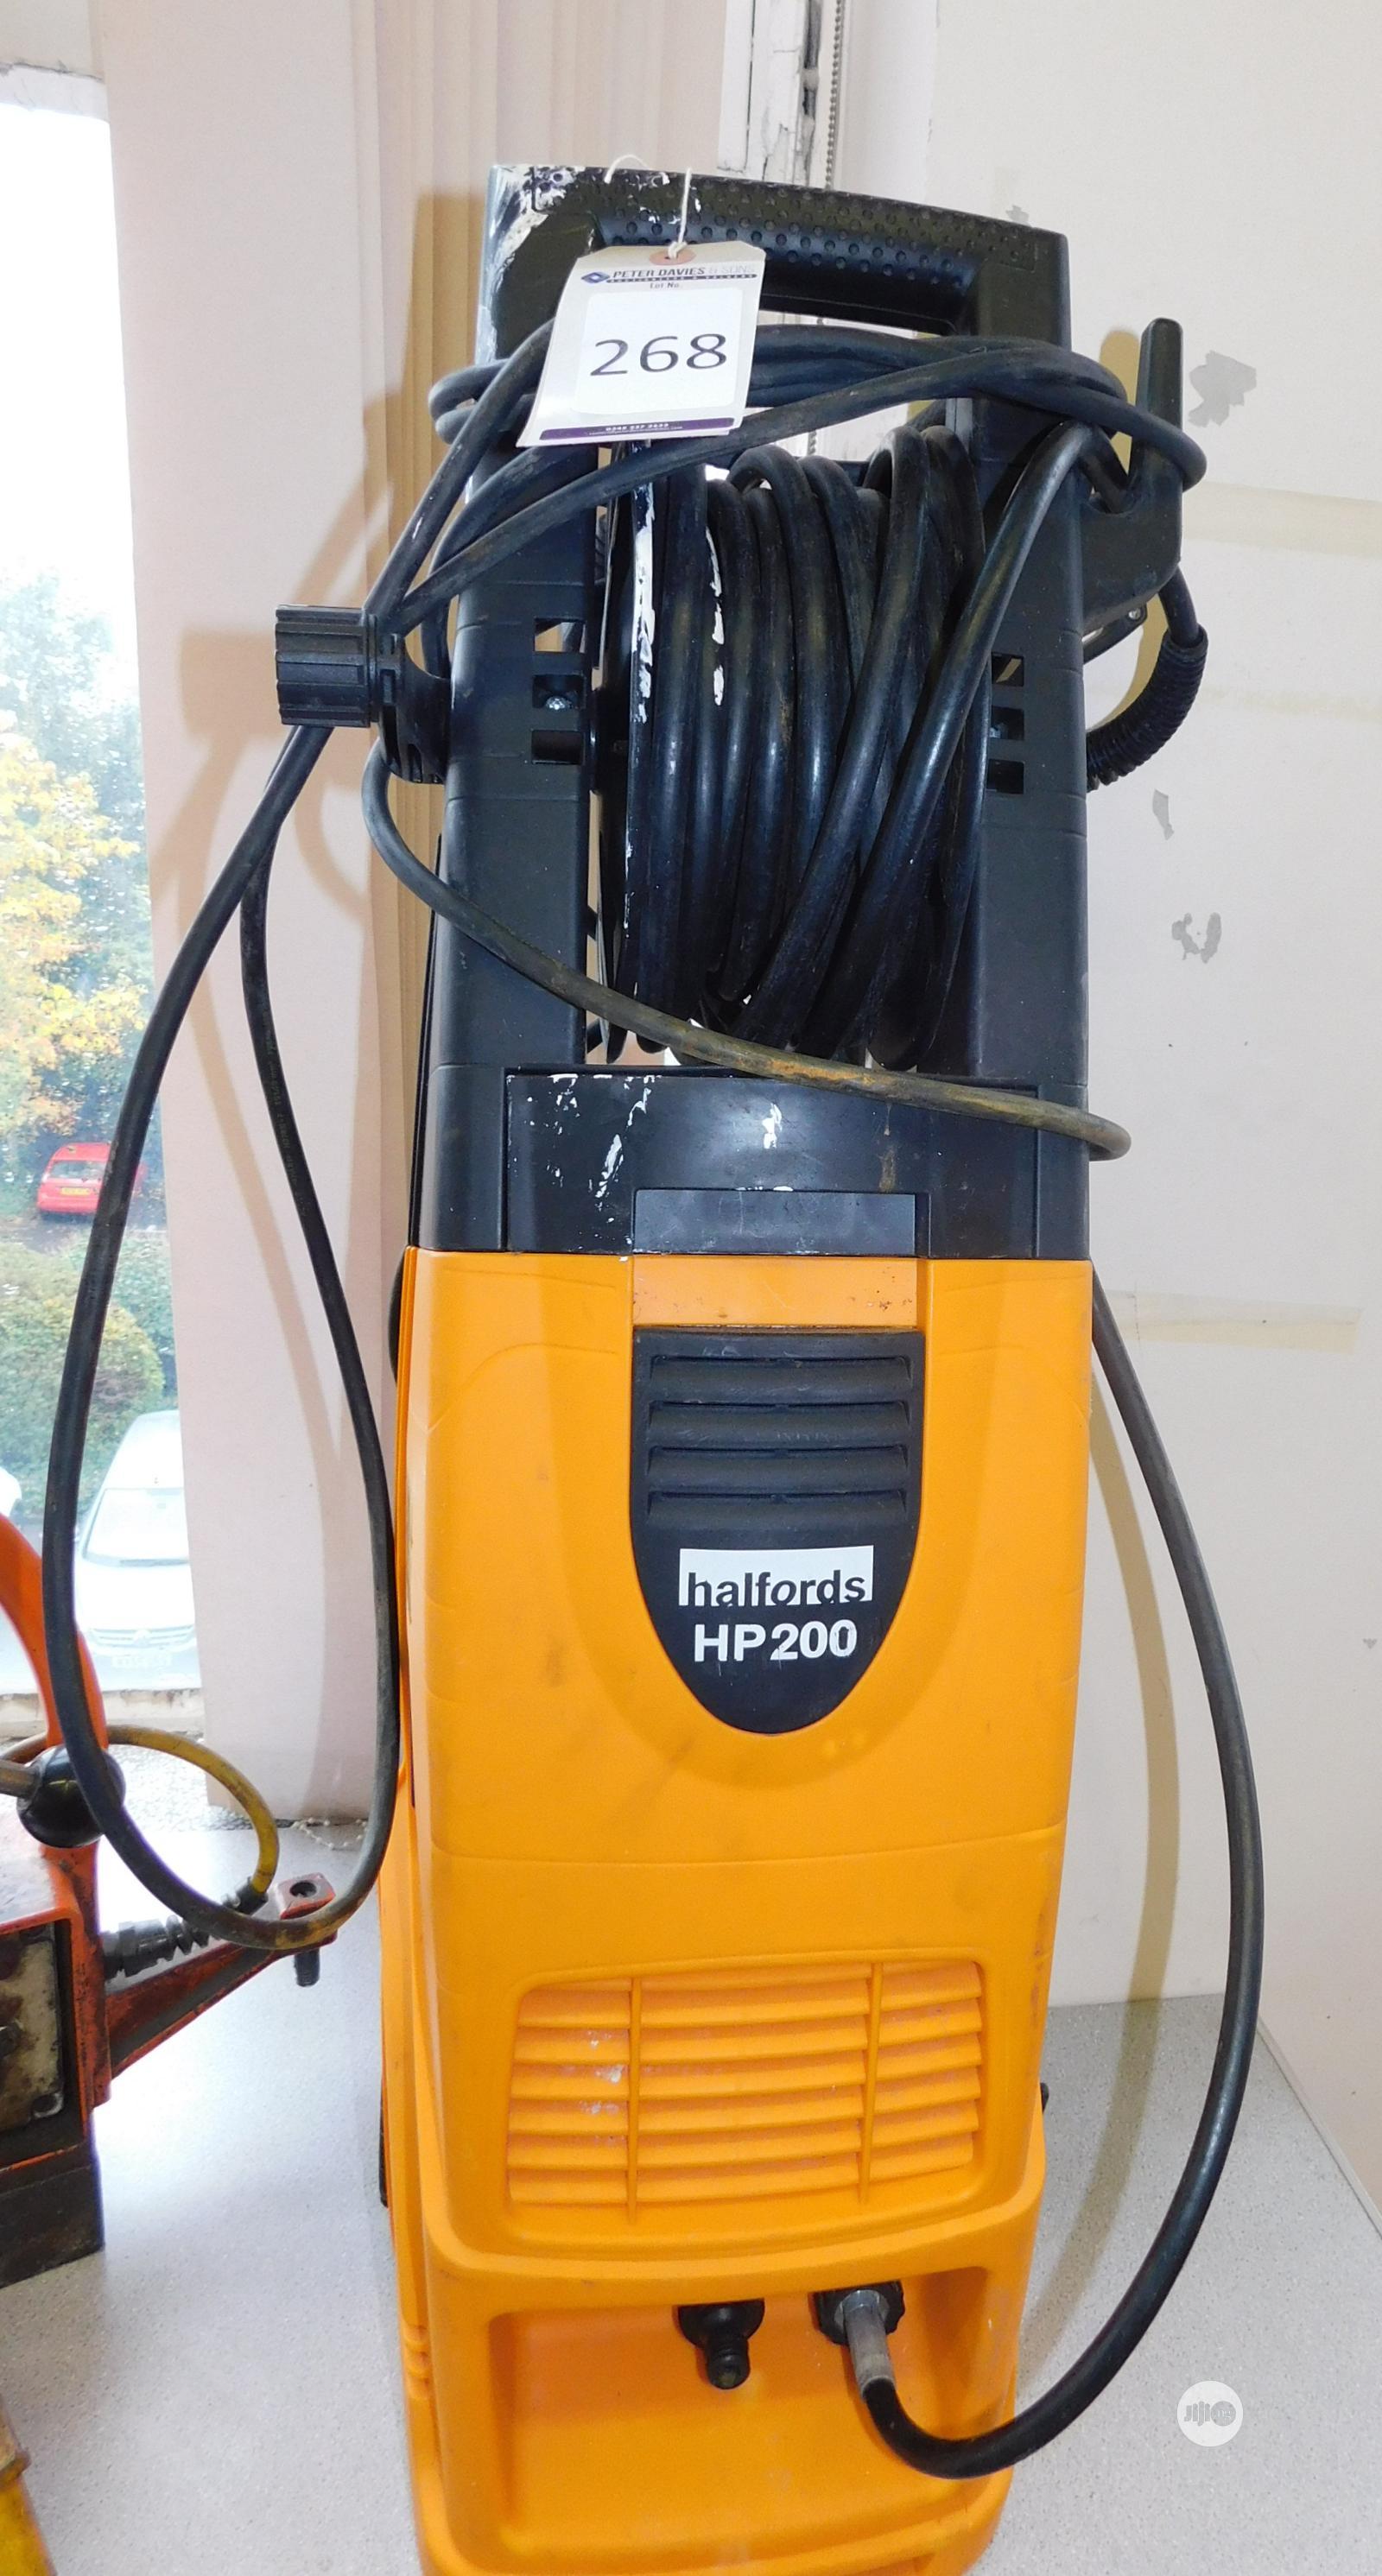 Halfords HP 200 (Cross Breeder) Giant High Pressure Washer